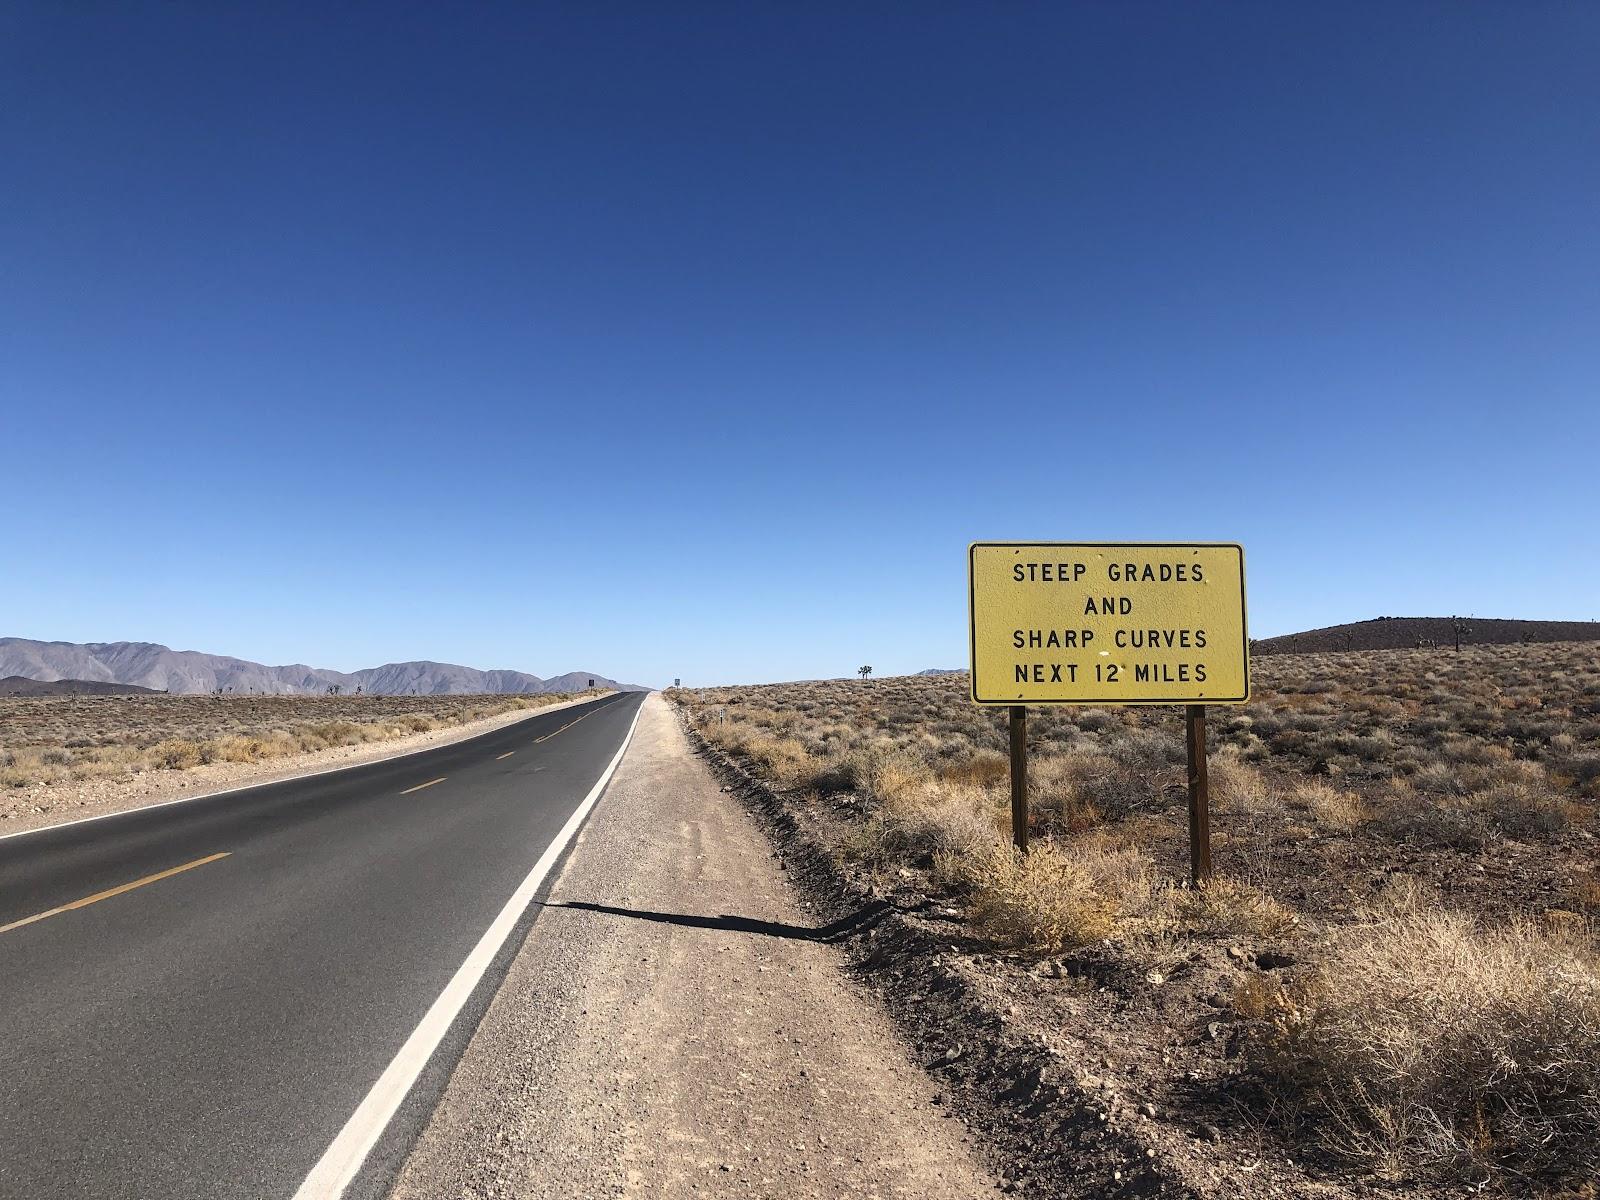 Biking Panamint Grade - steep grade sign, road and mountains